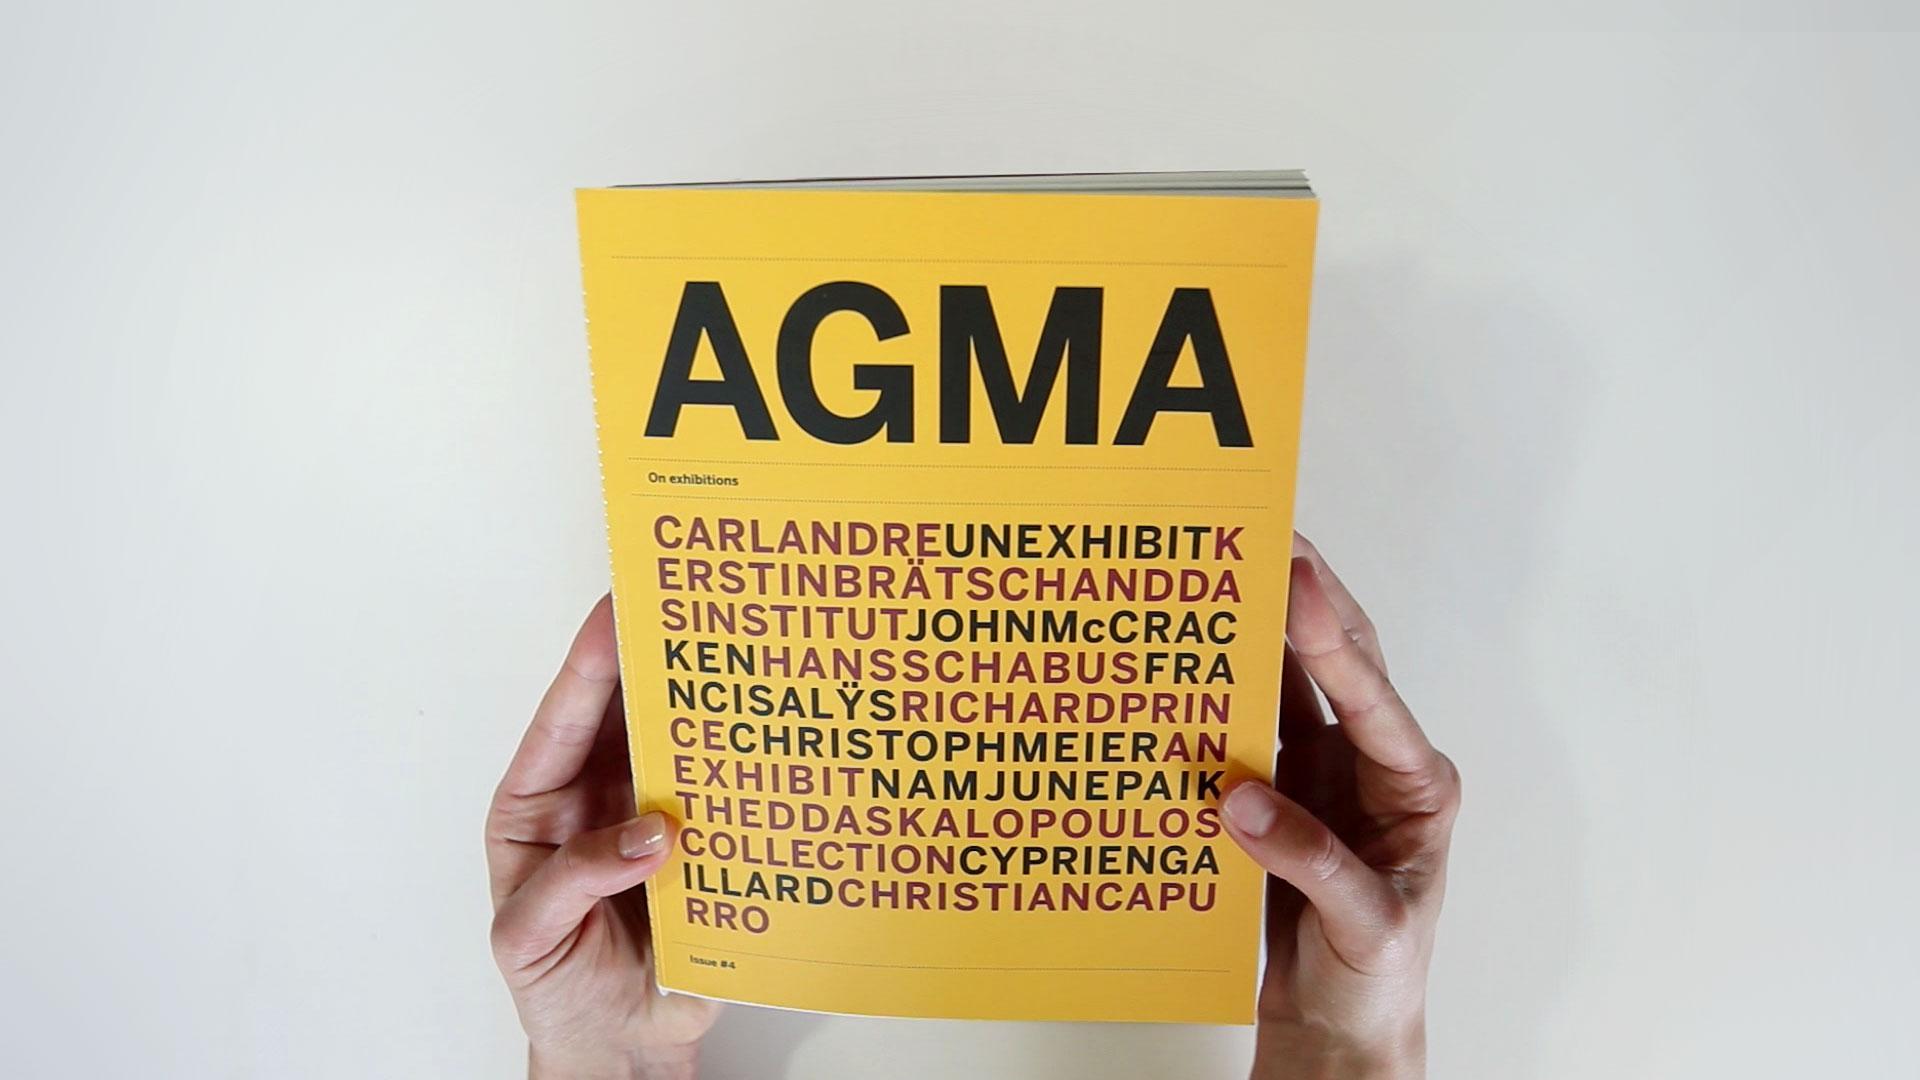 agma-website-8